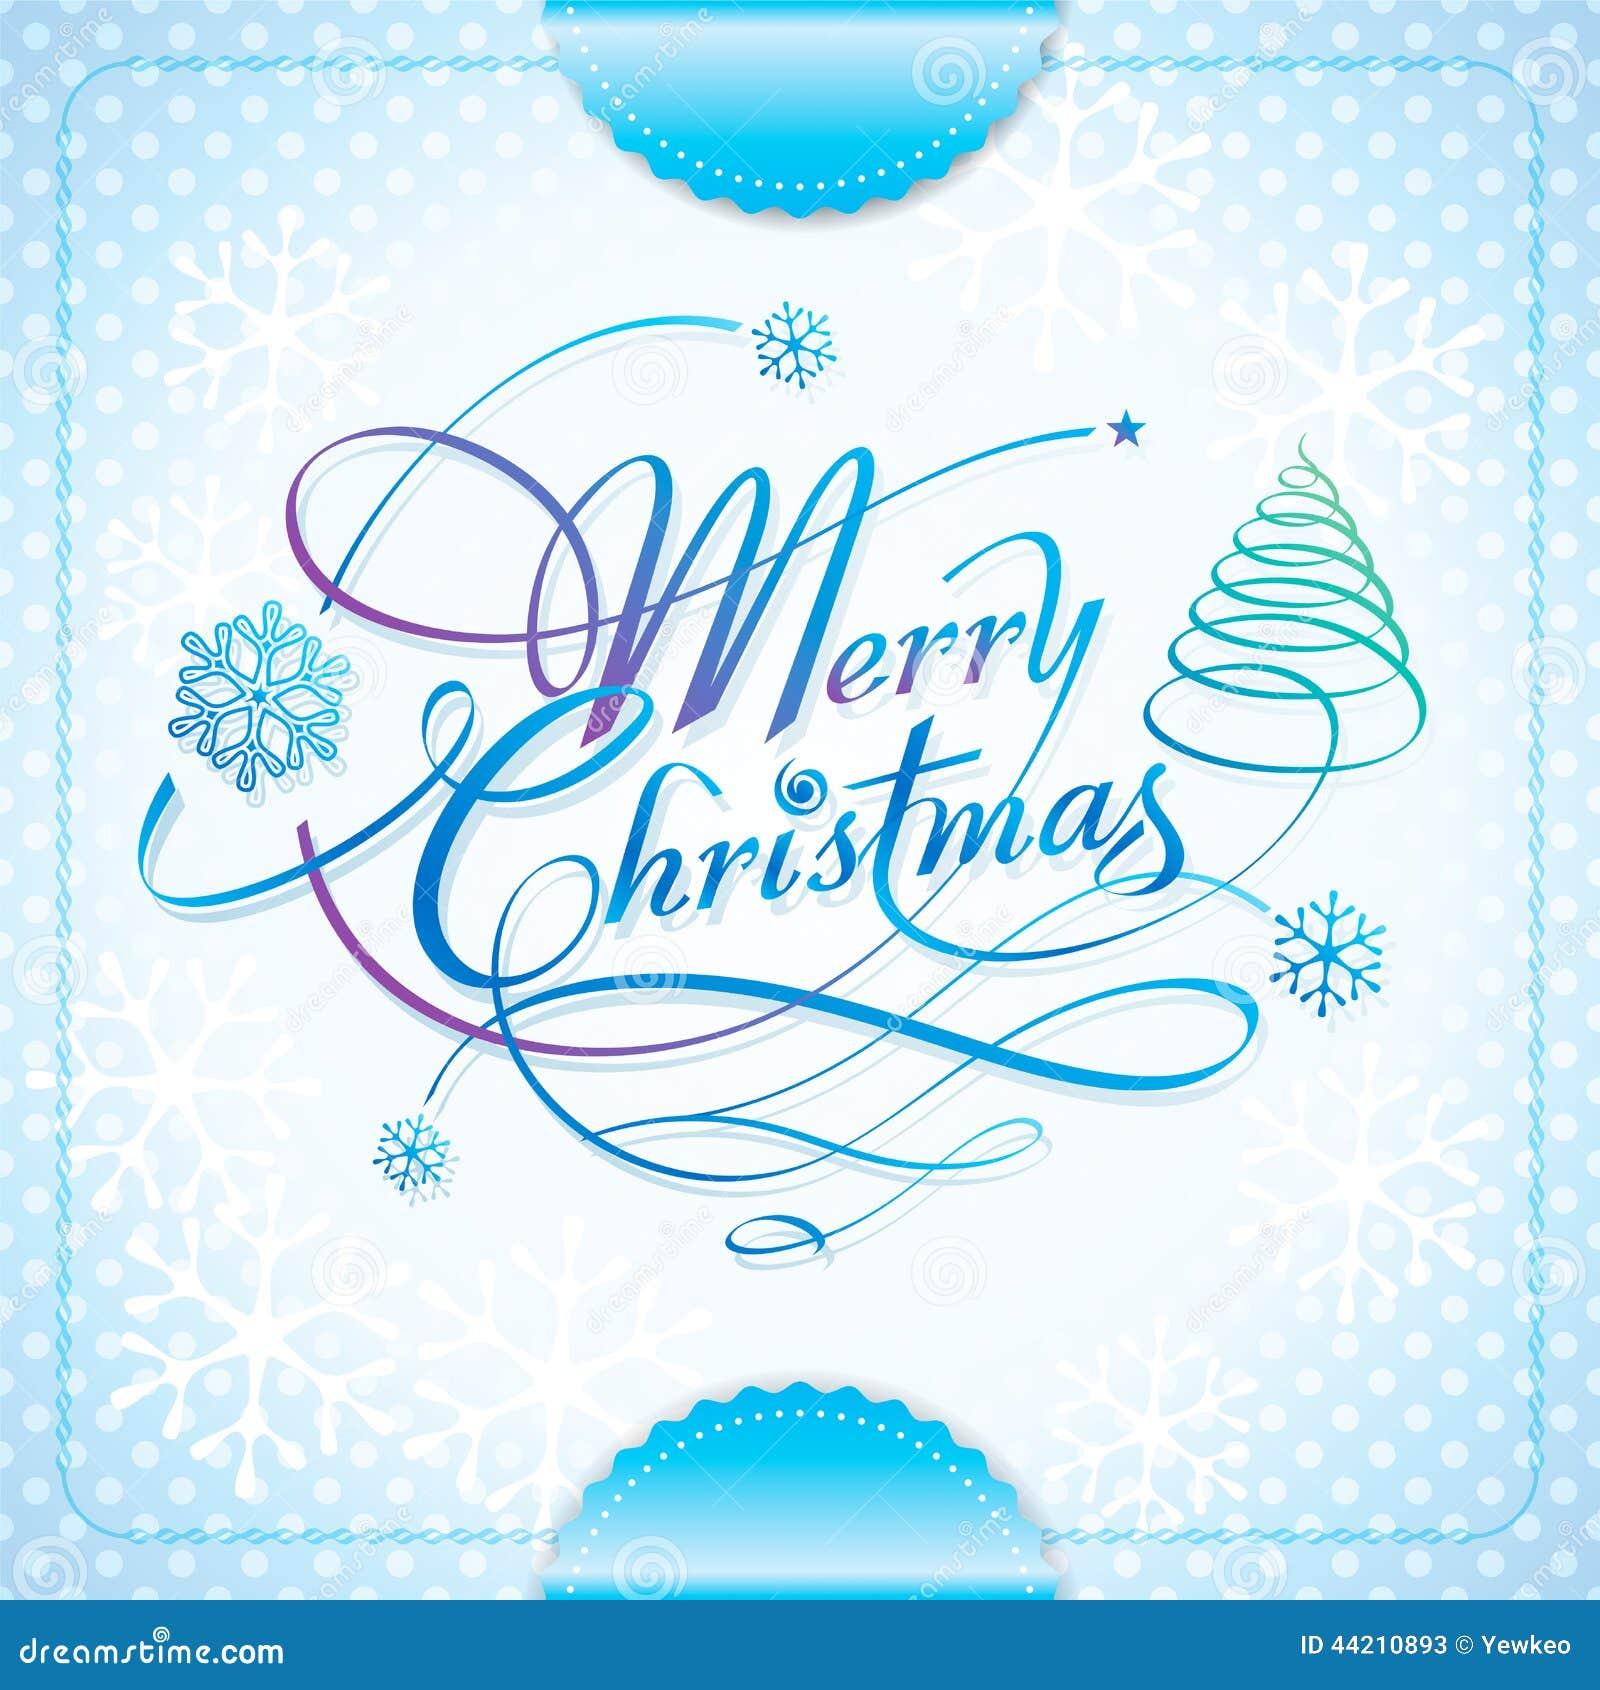 Merry Christmas Stock Vector